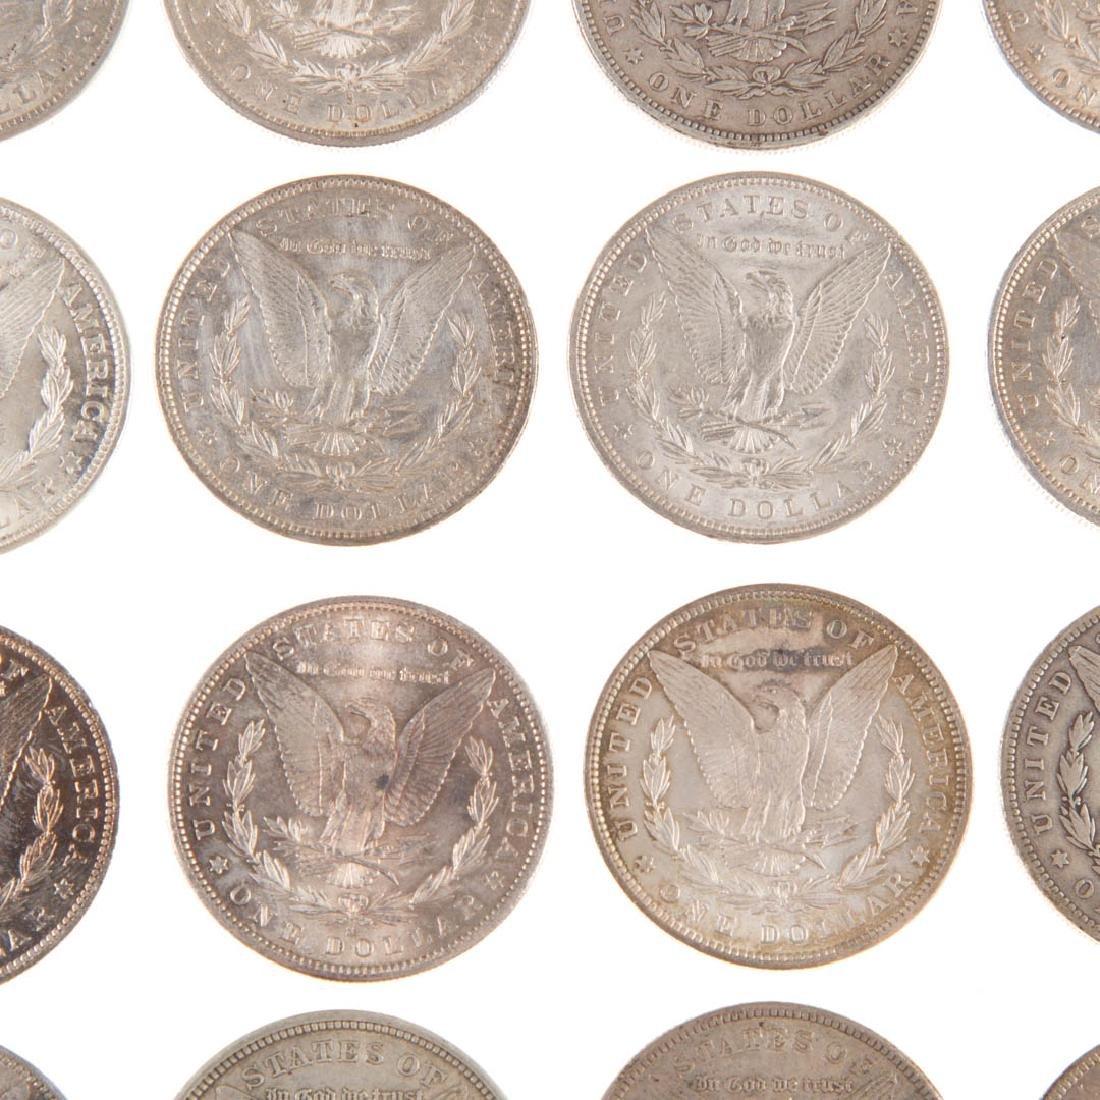 [US] Sixteen Morgan Silver Dollars - 4